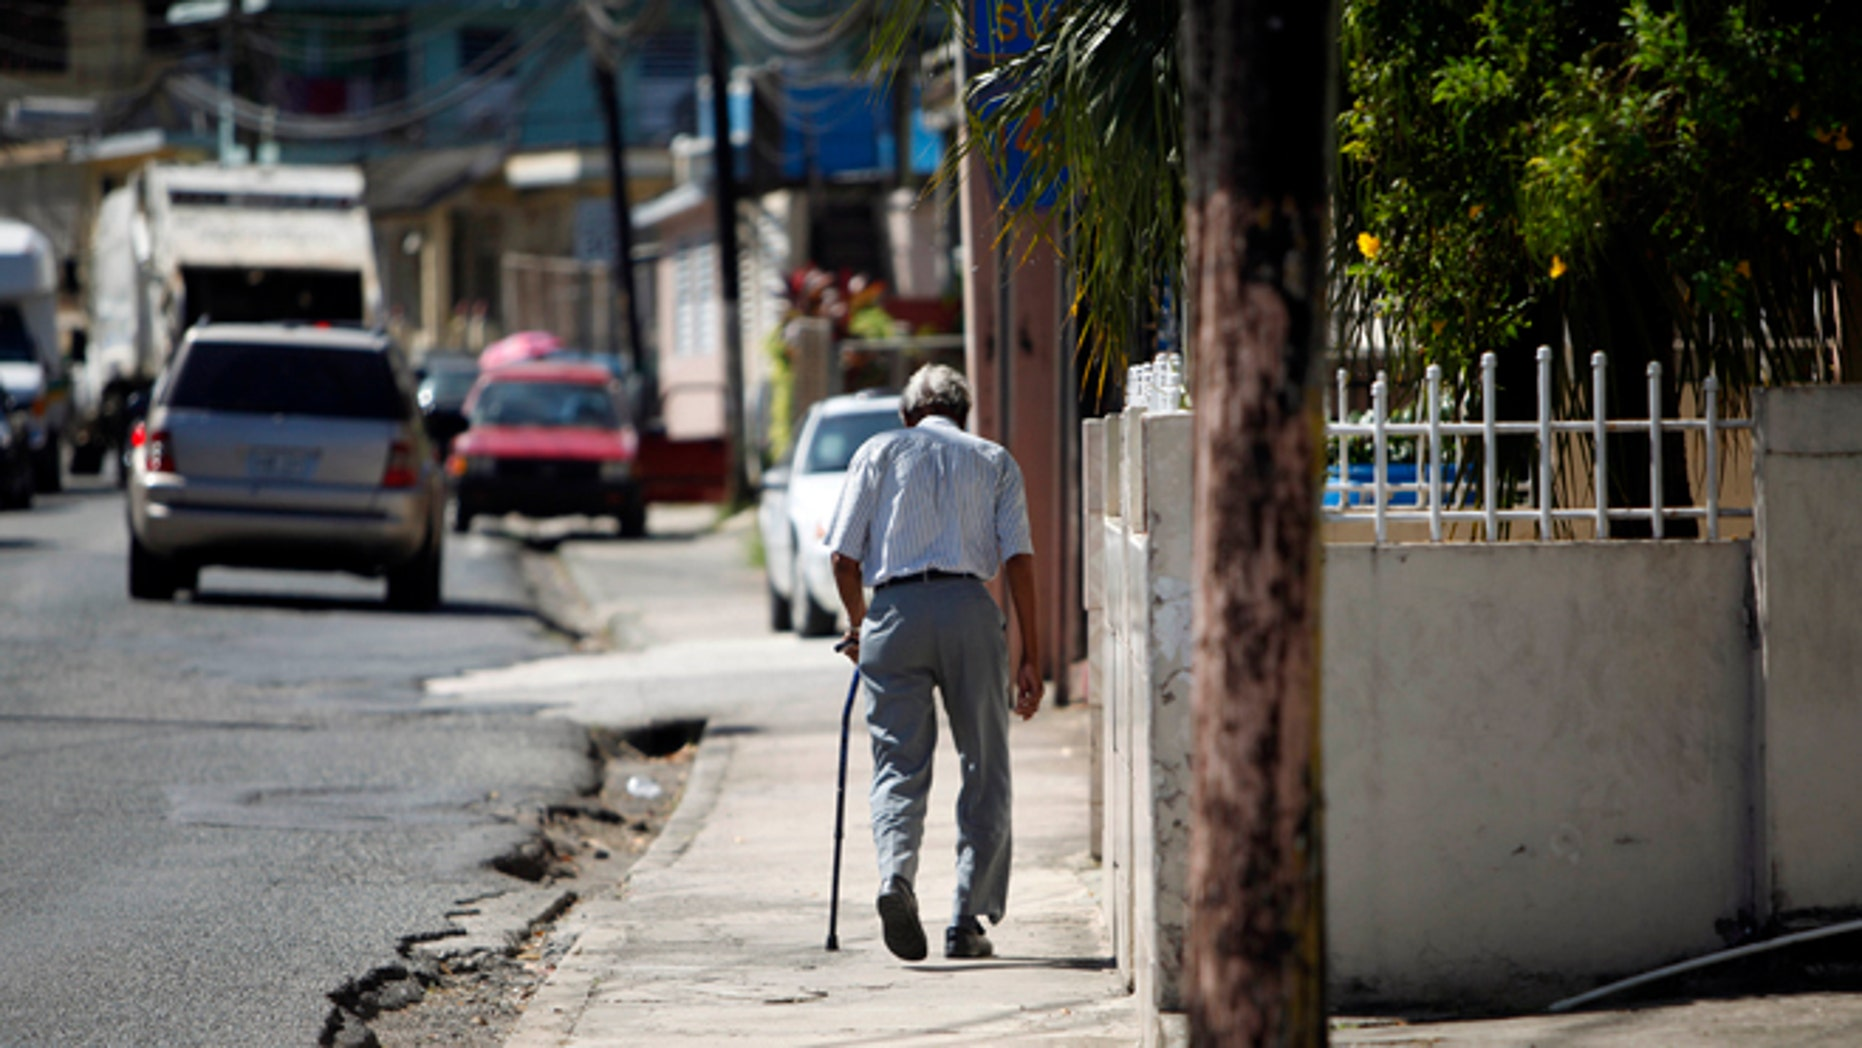 In this Nov. 14, 2013 photo, Mariano Perez Morales, 75, walks a sidewalk in Barceloneta, Puerto Rico.